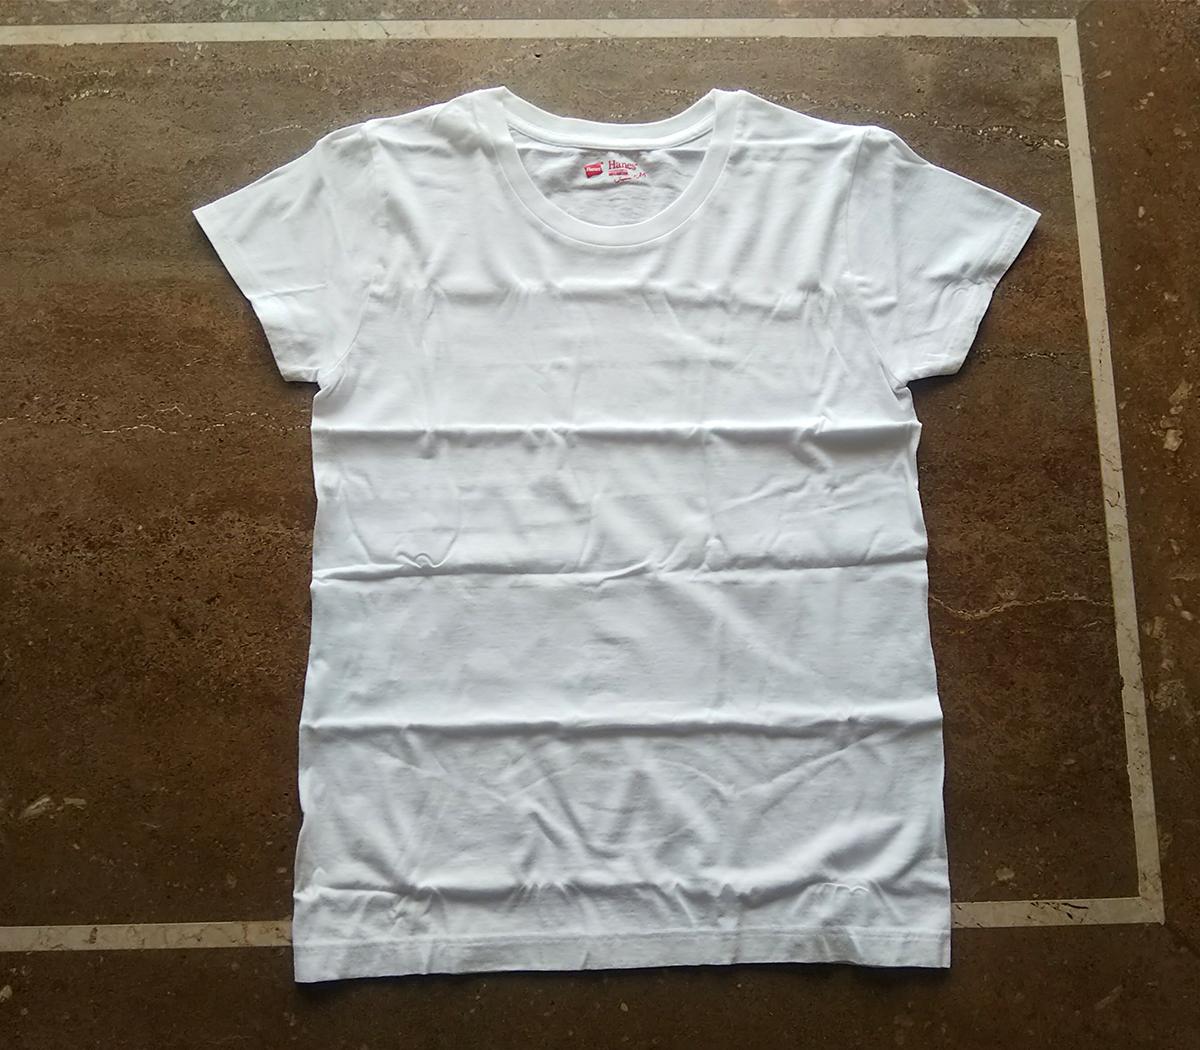 Hanes Tシャツ ジャパンフィット FOR HER